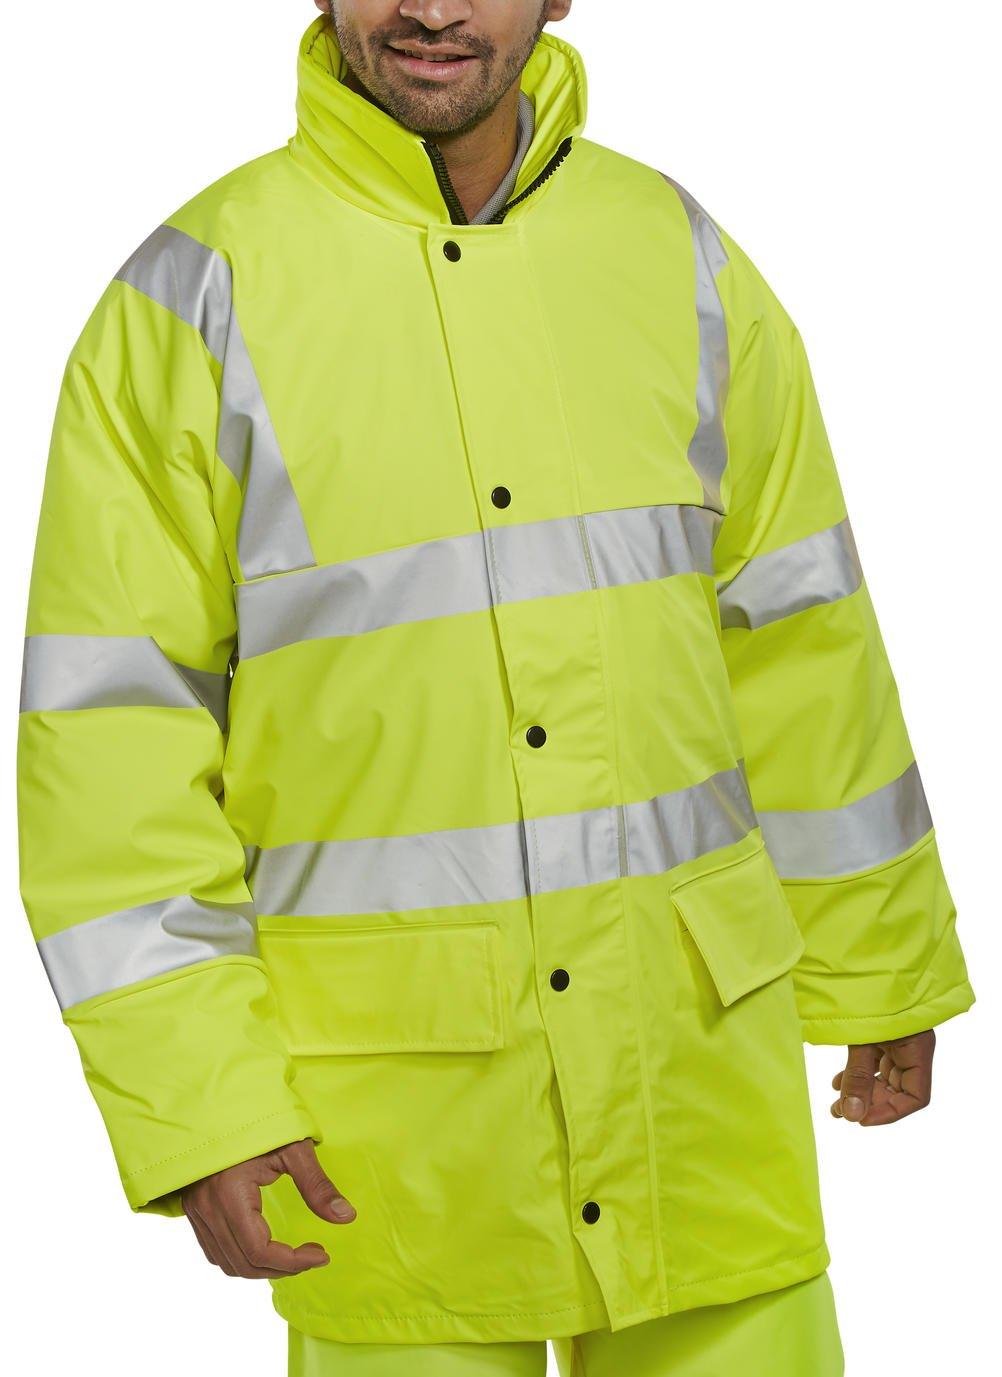 Bseen Polyurethan Lined Jacket 471Saturn Yellow XXL